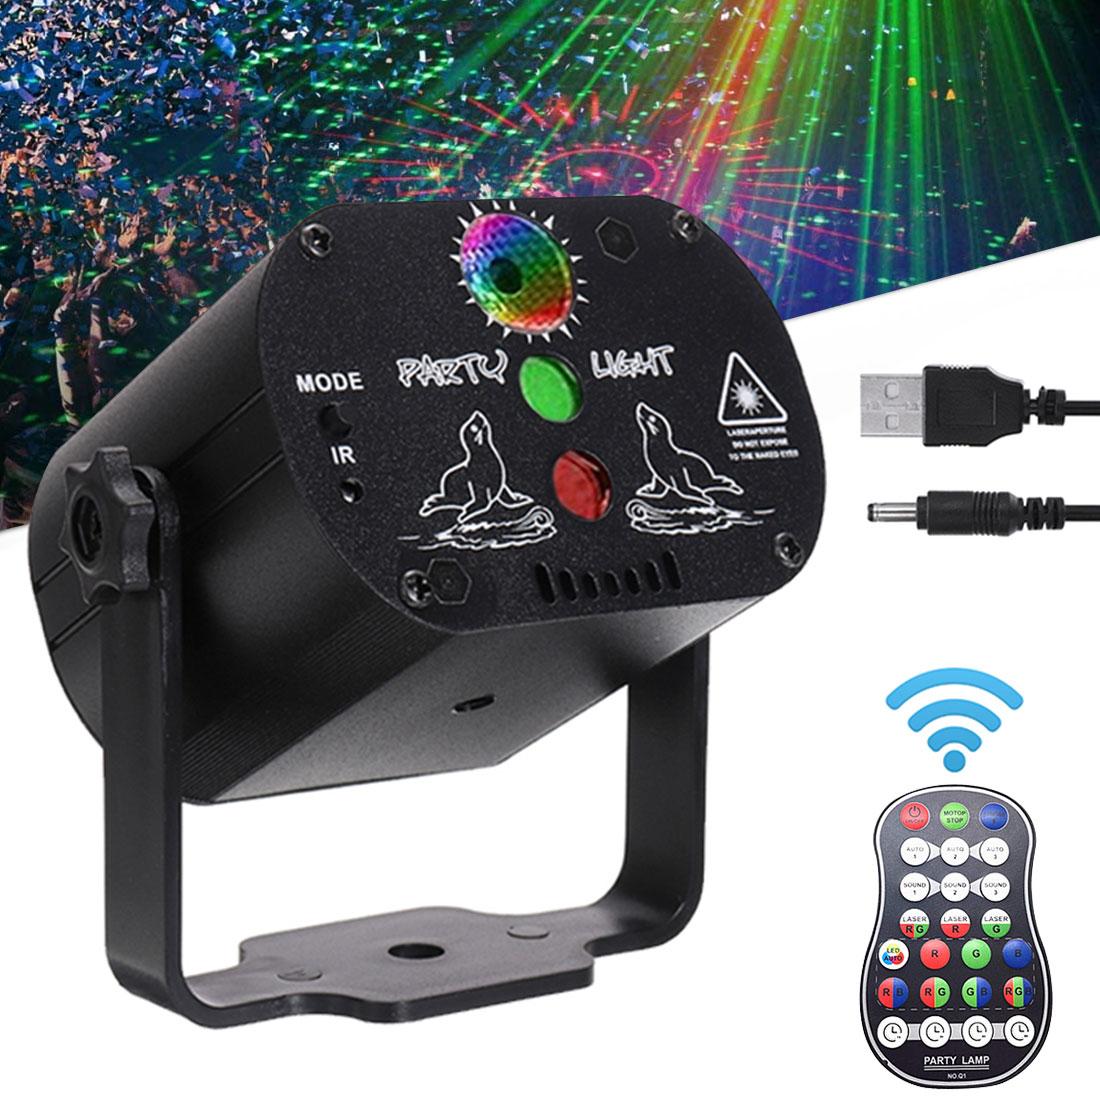 Mini luz LED RGB para discoteca, 60 patrones, recargable por USB, lámpara de proyección láser de 5V, iluminación para escenarios, espectáculos, bodas, fiestas, KTV DJ, pista de baile